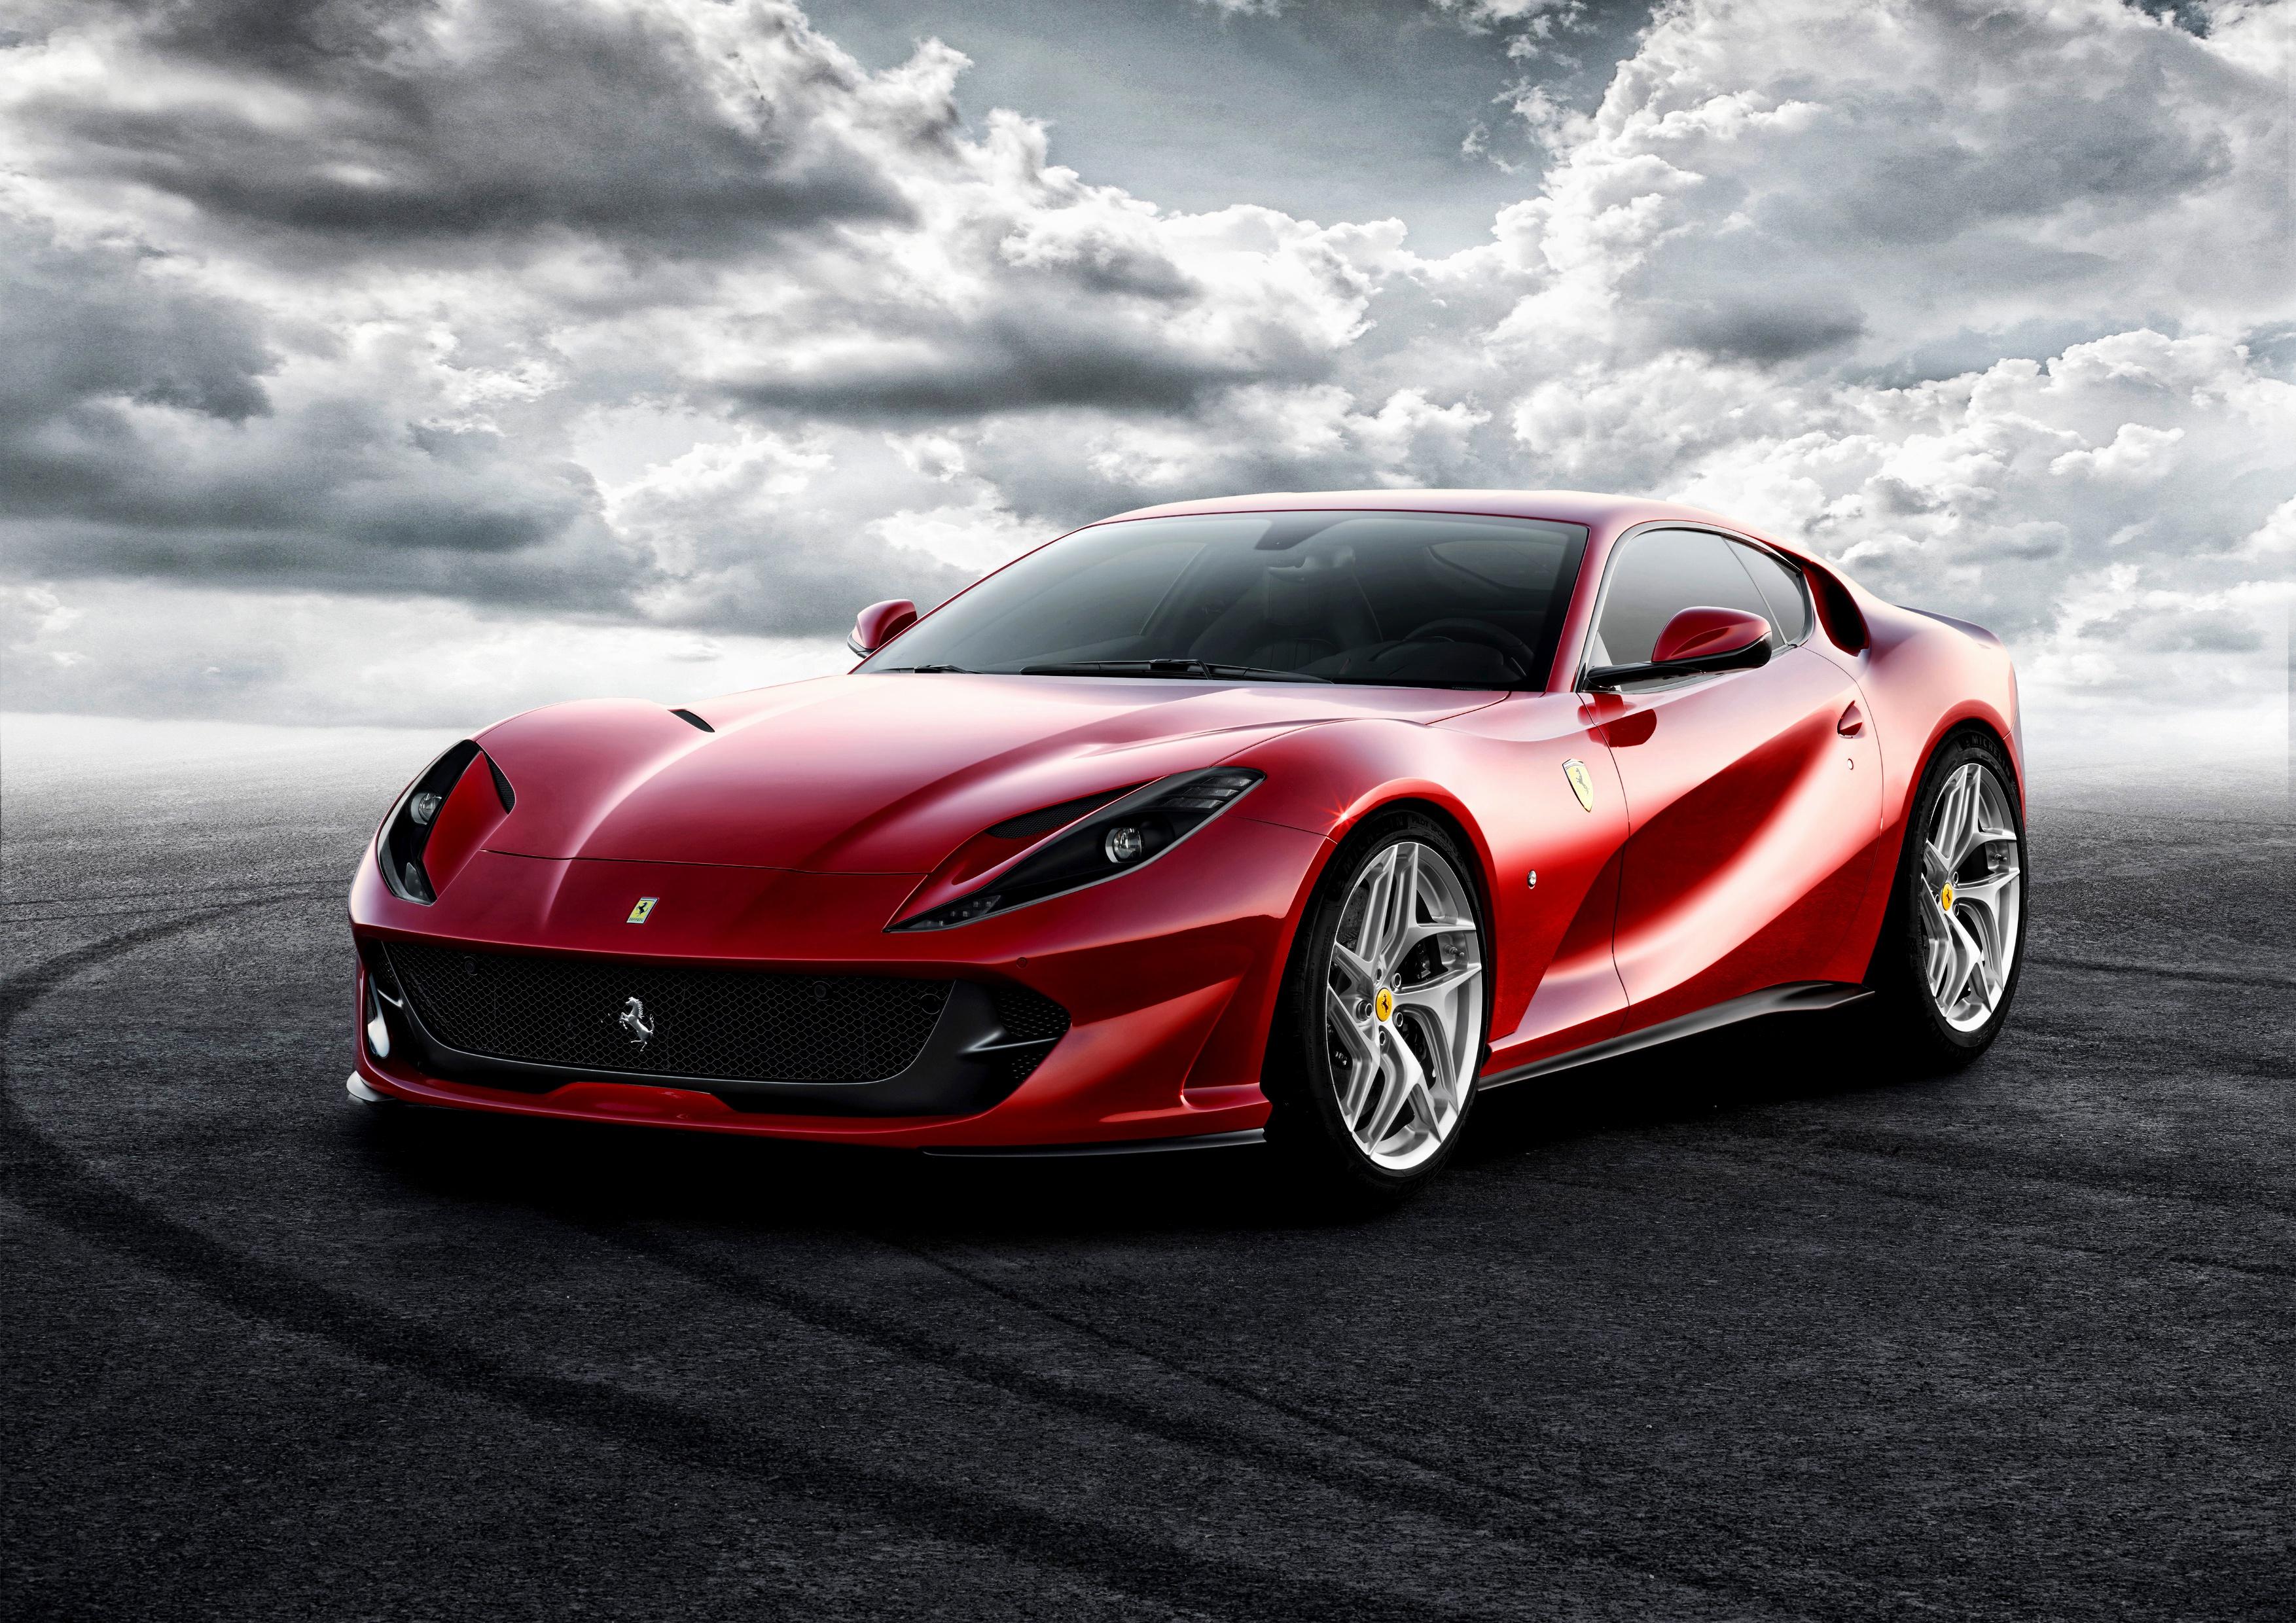 Ferrari 812 Superfast HD Wallpaper | Background Image ...